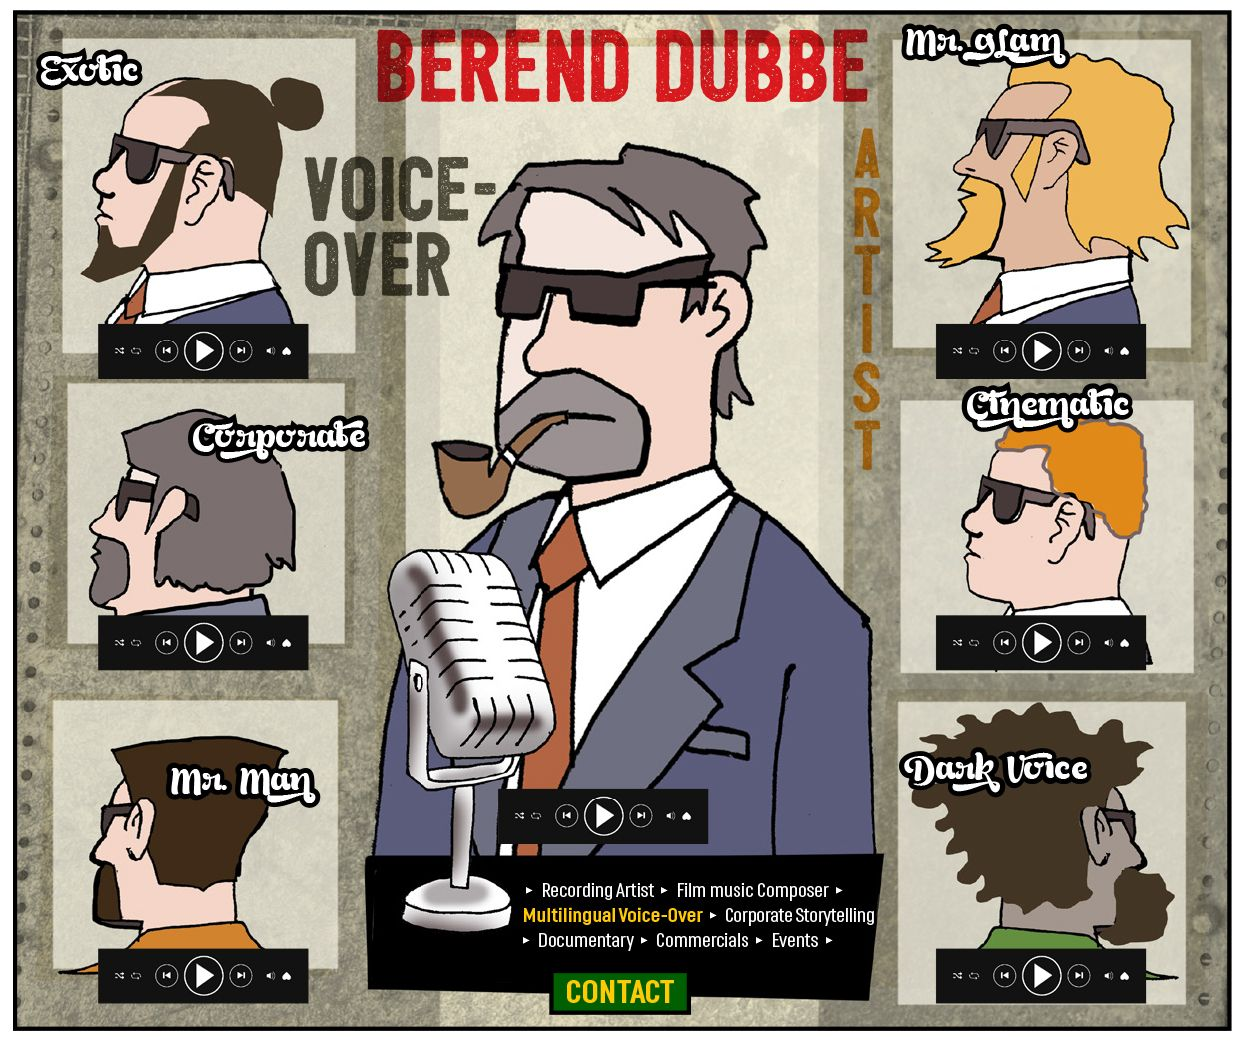 Online design proposal for Berend Dubbe voiceover artist